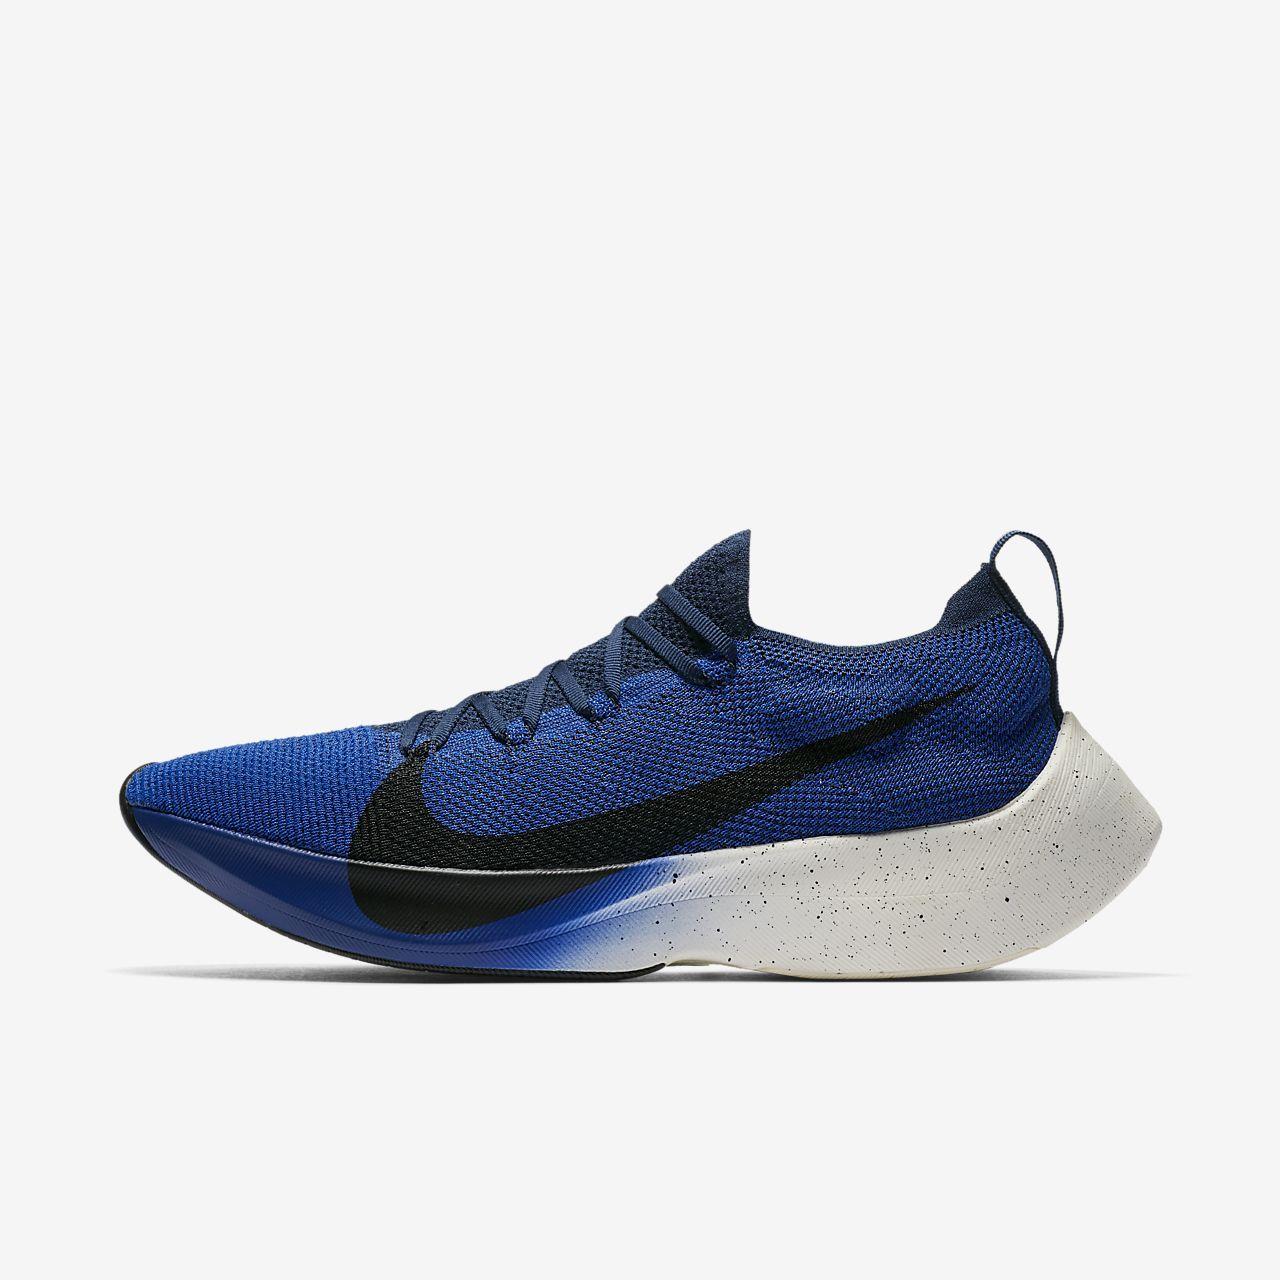 Vapor Flyknit Sneakers React Nike Men's ShoeOutfits Street 4Aqc35jLR